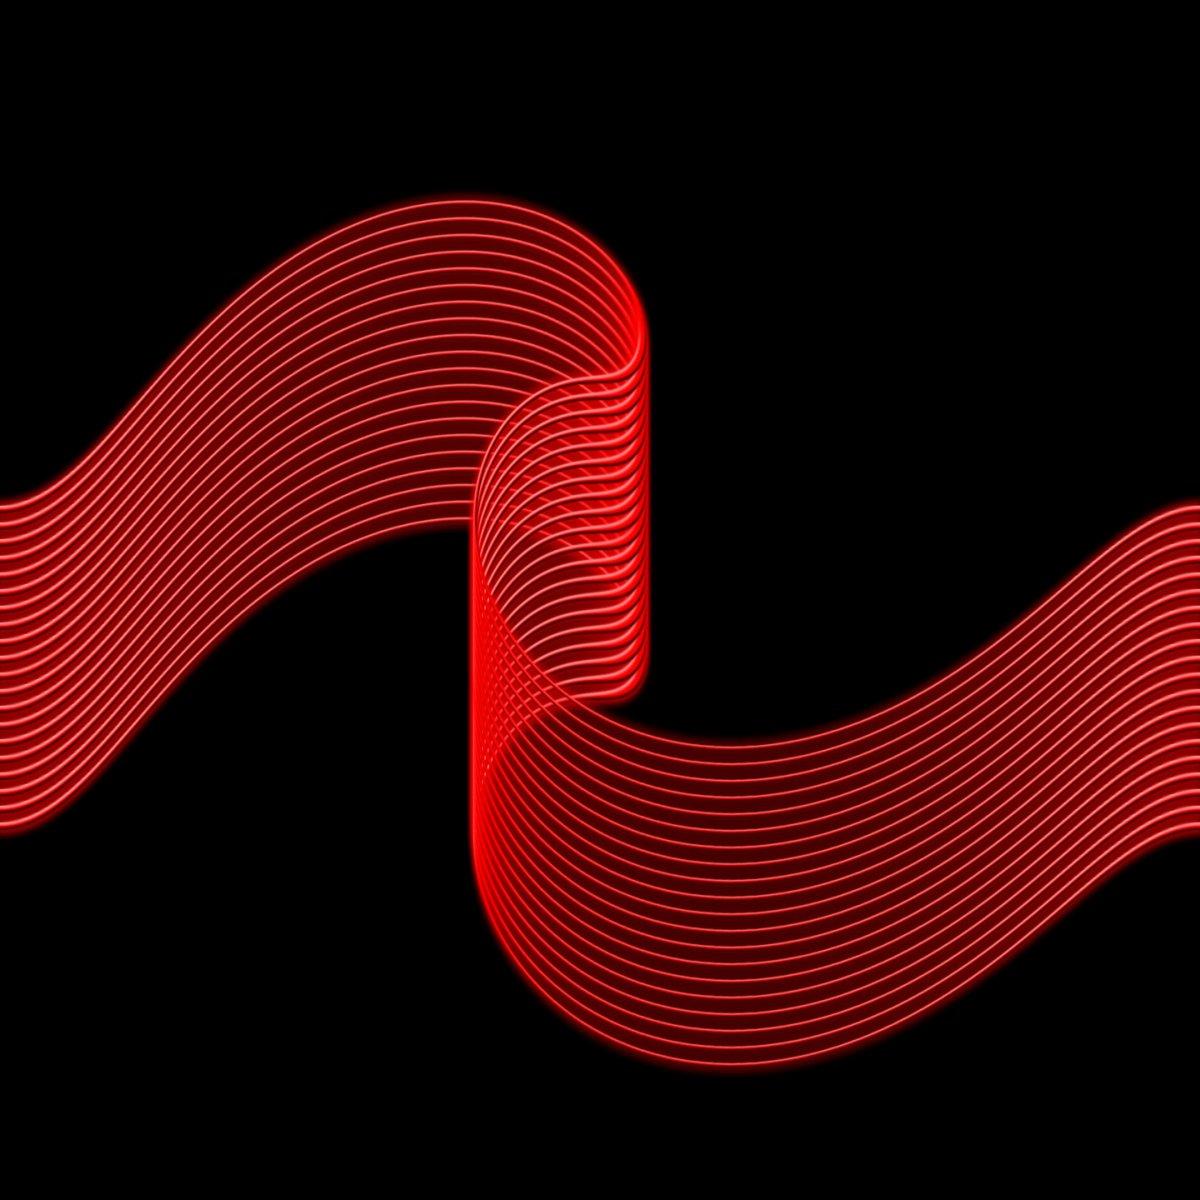 Maniac247 - Red & Black